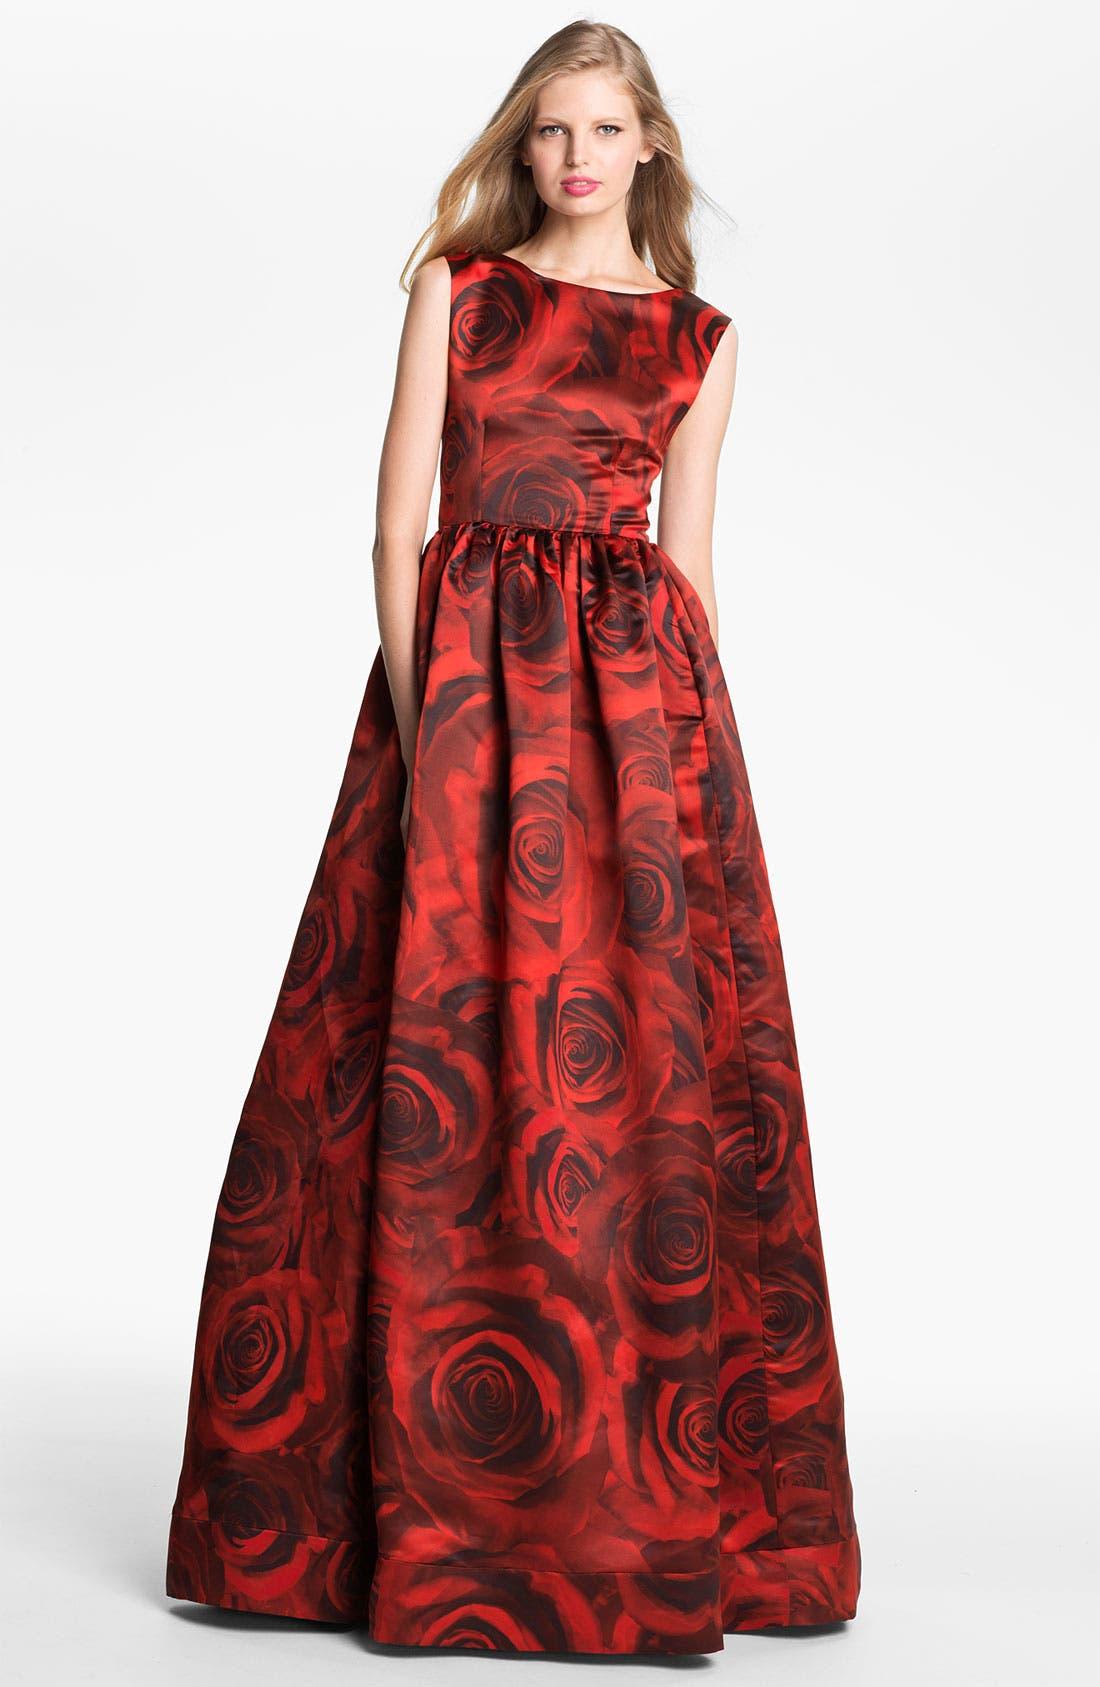 Alternate Image 1 Selected - Alice + Olivia 'Lano' Rose Print Ballgown